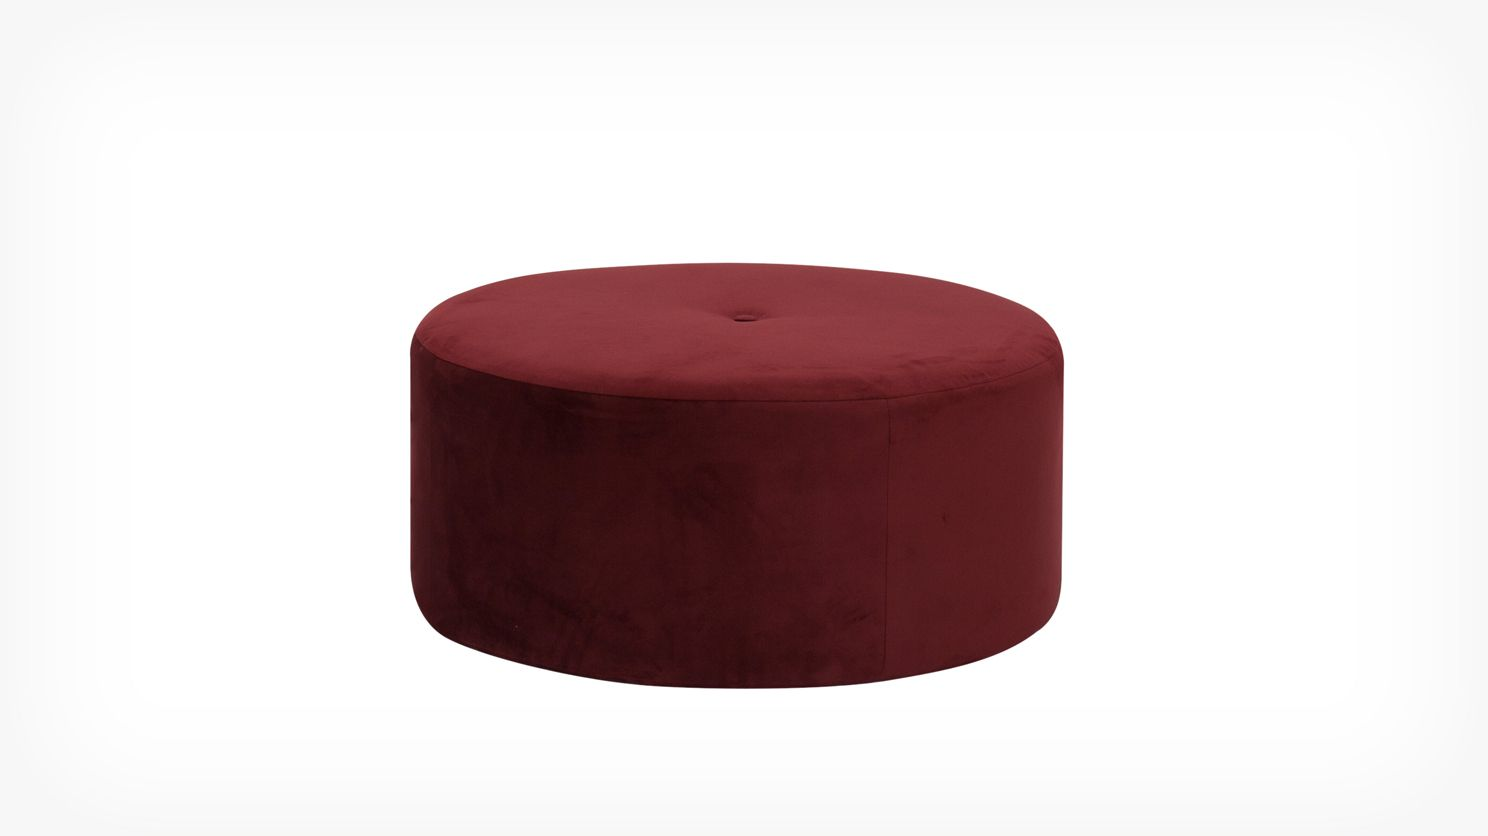 Incredible Sphere Ottoman Fabric Poufs Fabric Ottoman Ottoman Inzonedesignstudio Interior Chair Design Inzonedesignstudiocom